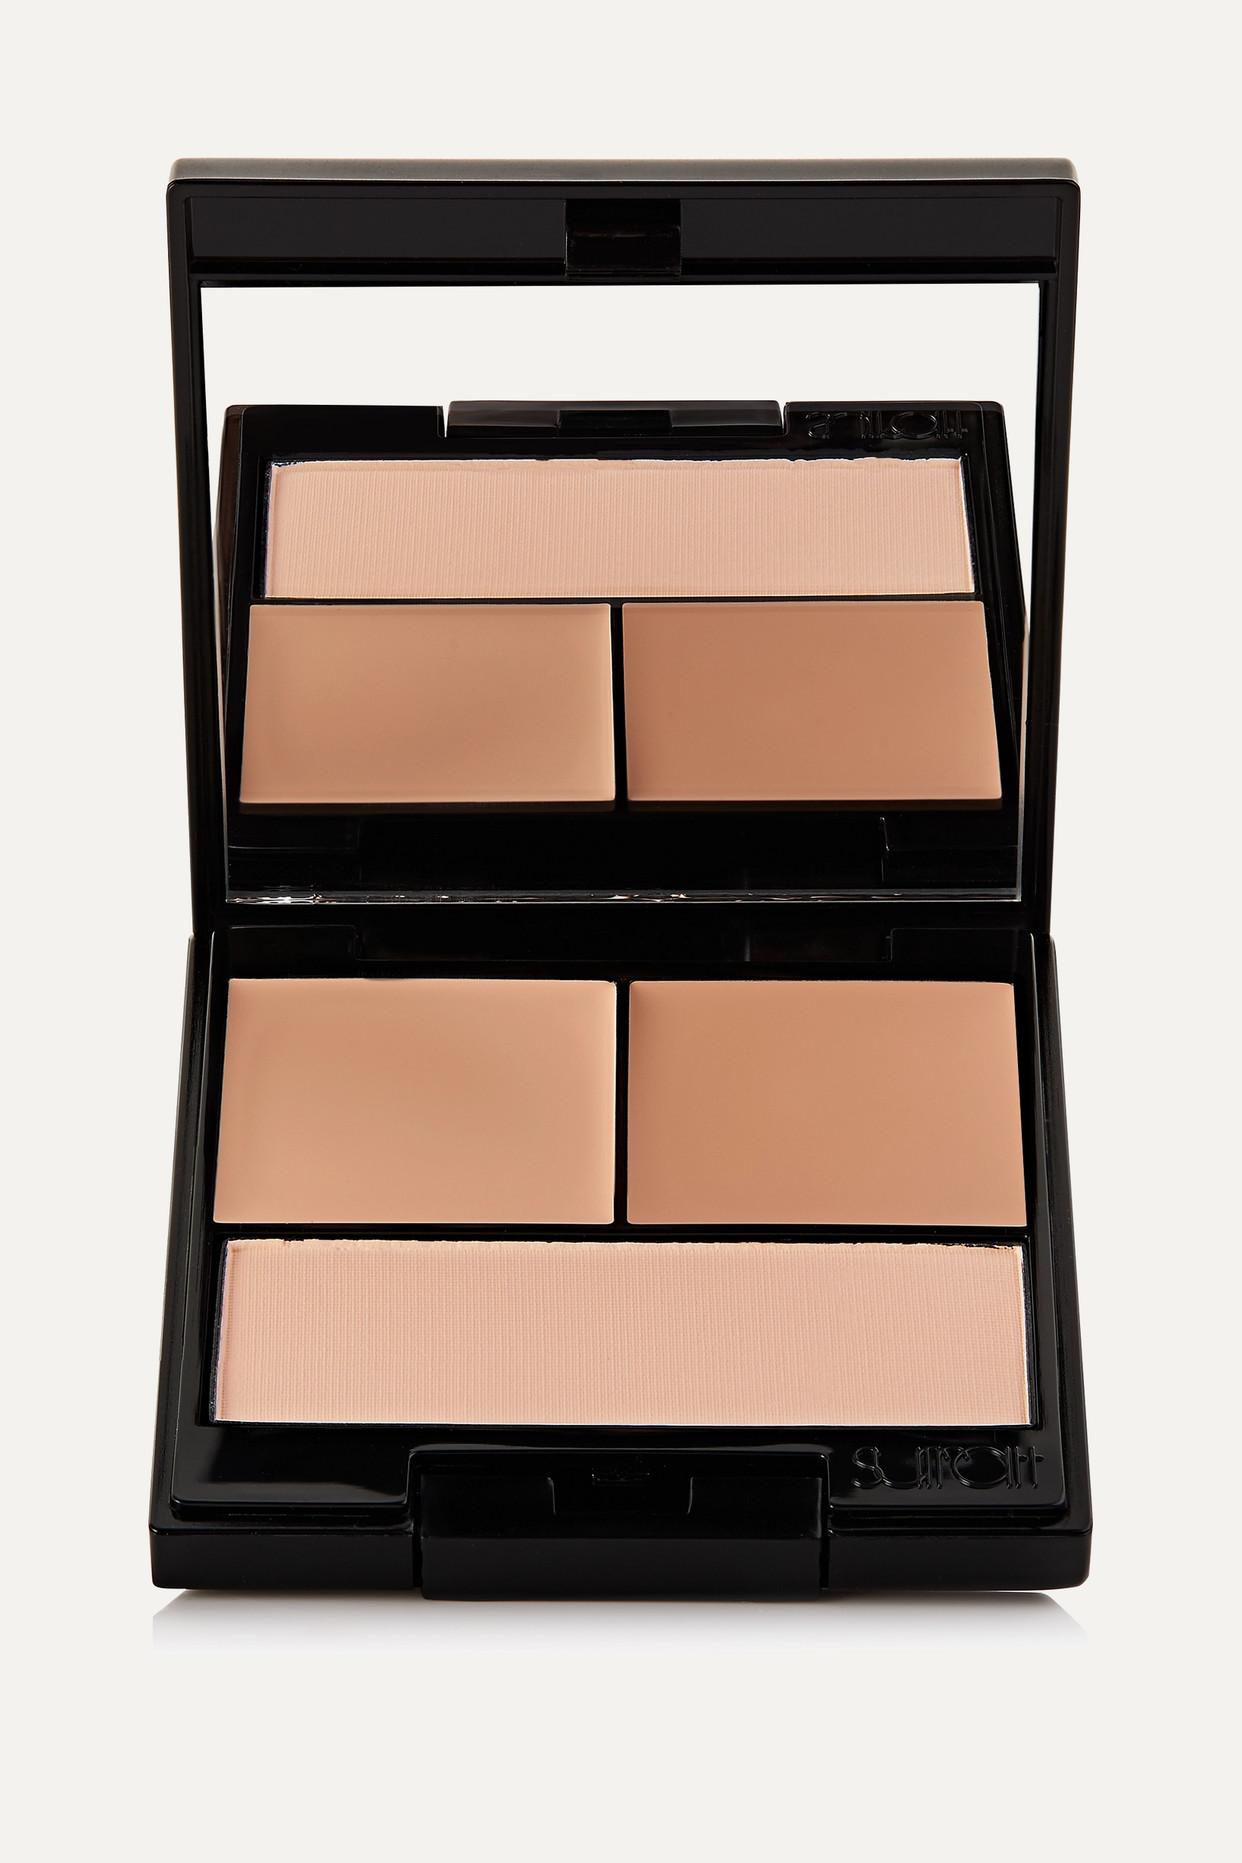 SURRATT BEAUTY - Perfectionniste Concealer Palette - Shade 4 - Neutrals - one size